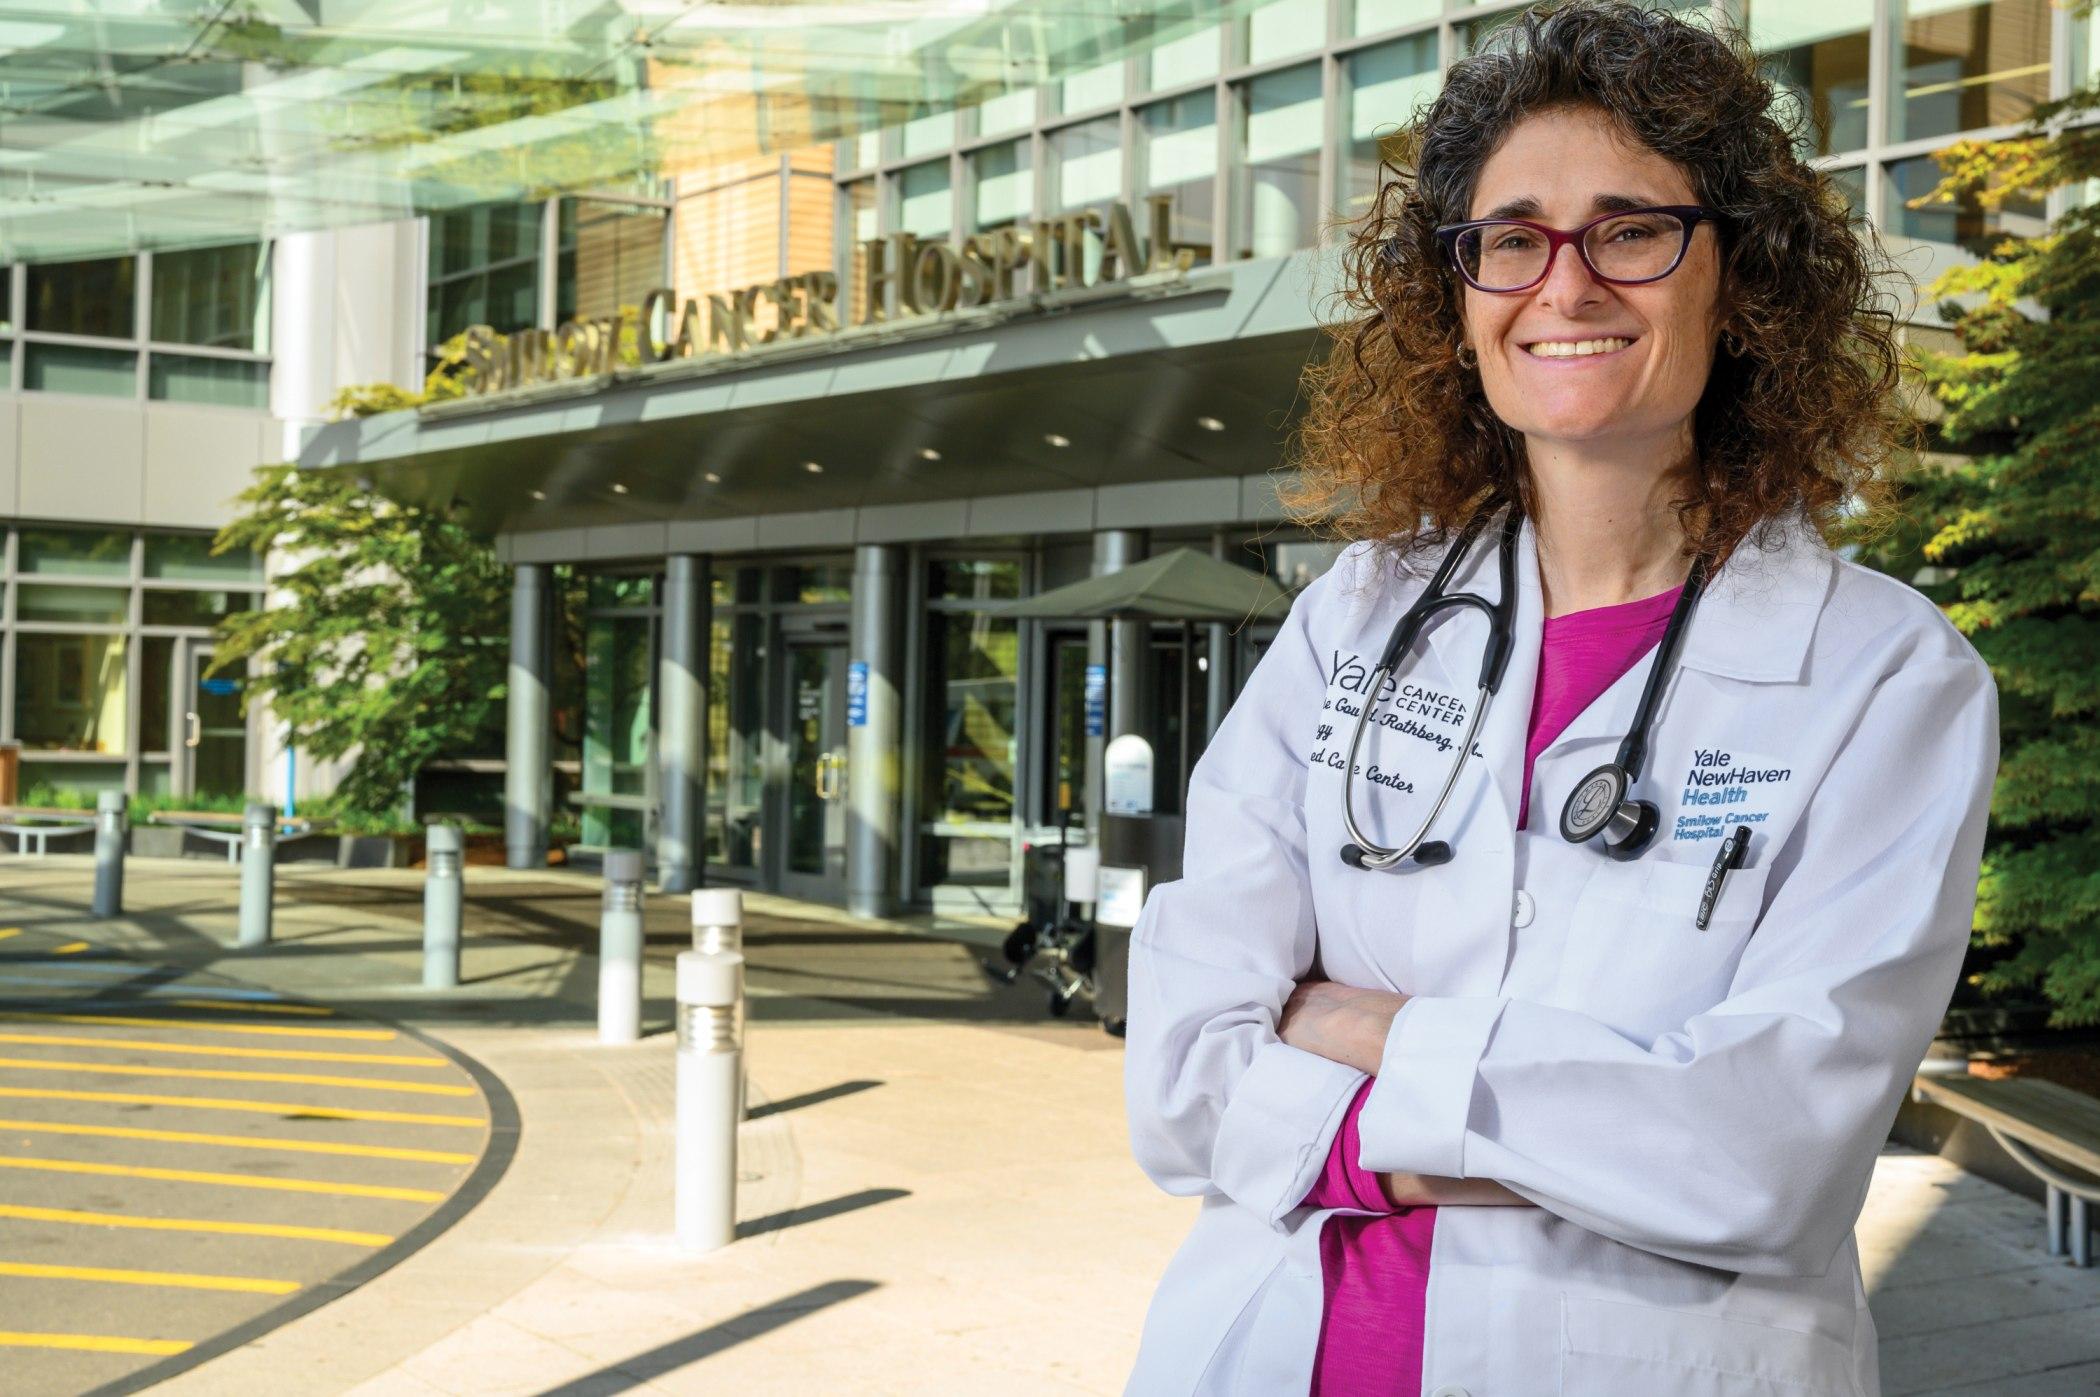 Dr. Bonnie Gould Rothberg